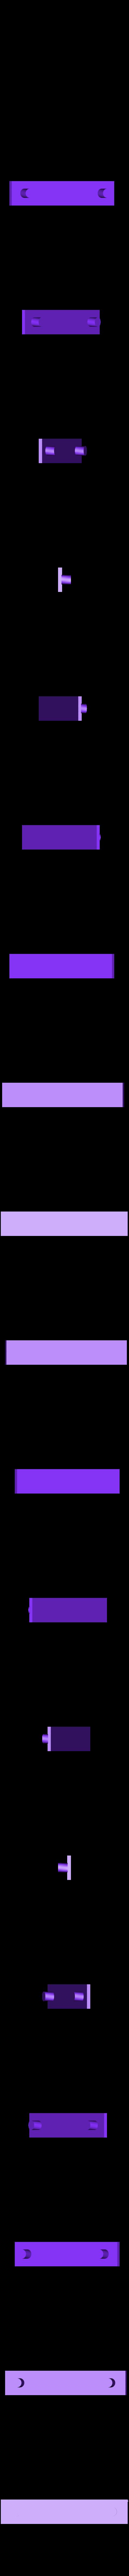 zip-fix-lid.stl Download free STL file Zip-Fix (replacement zipper tab or tag system) • 3D printable model, Khuxtan